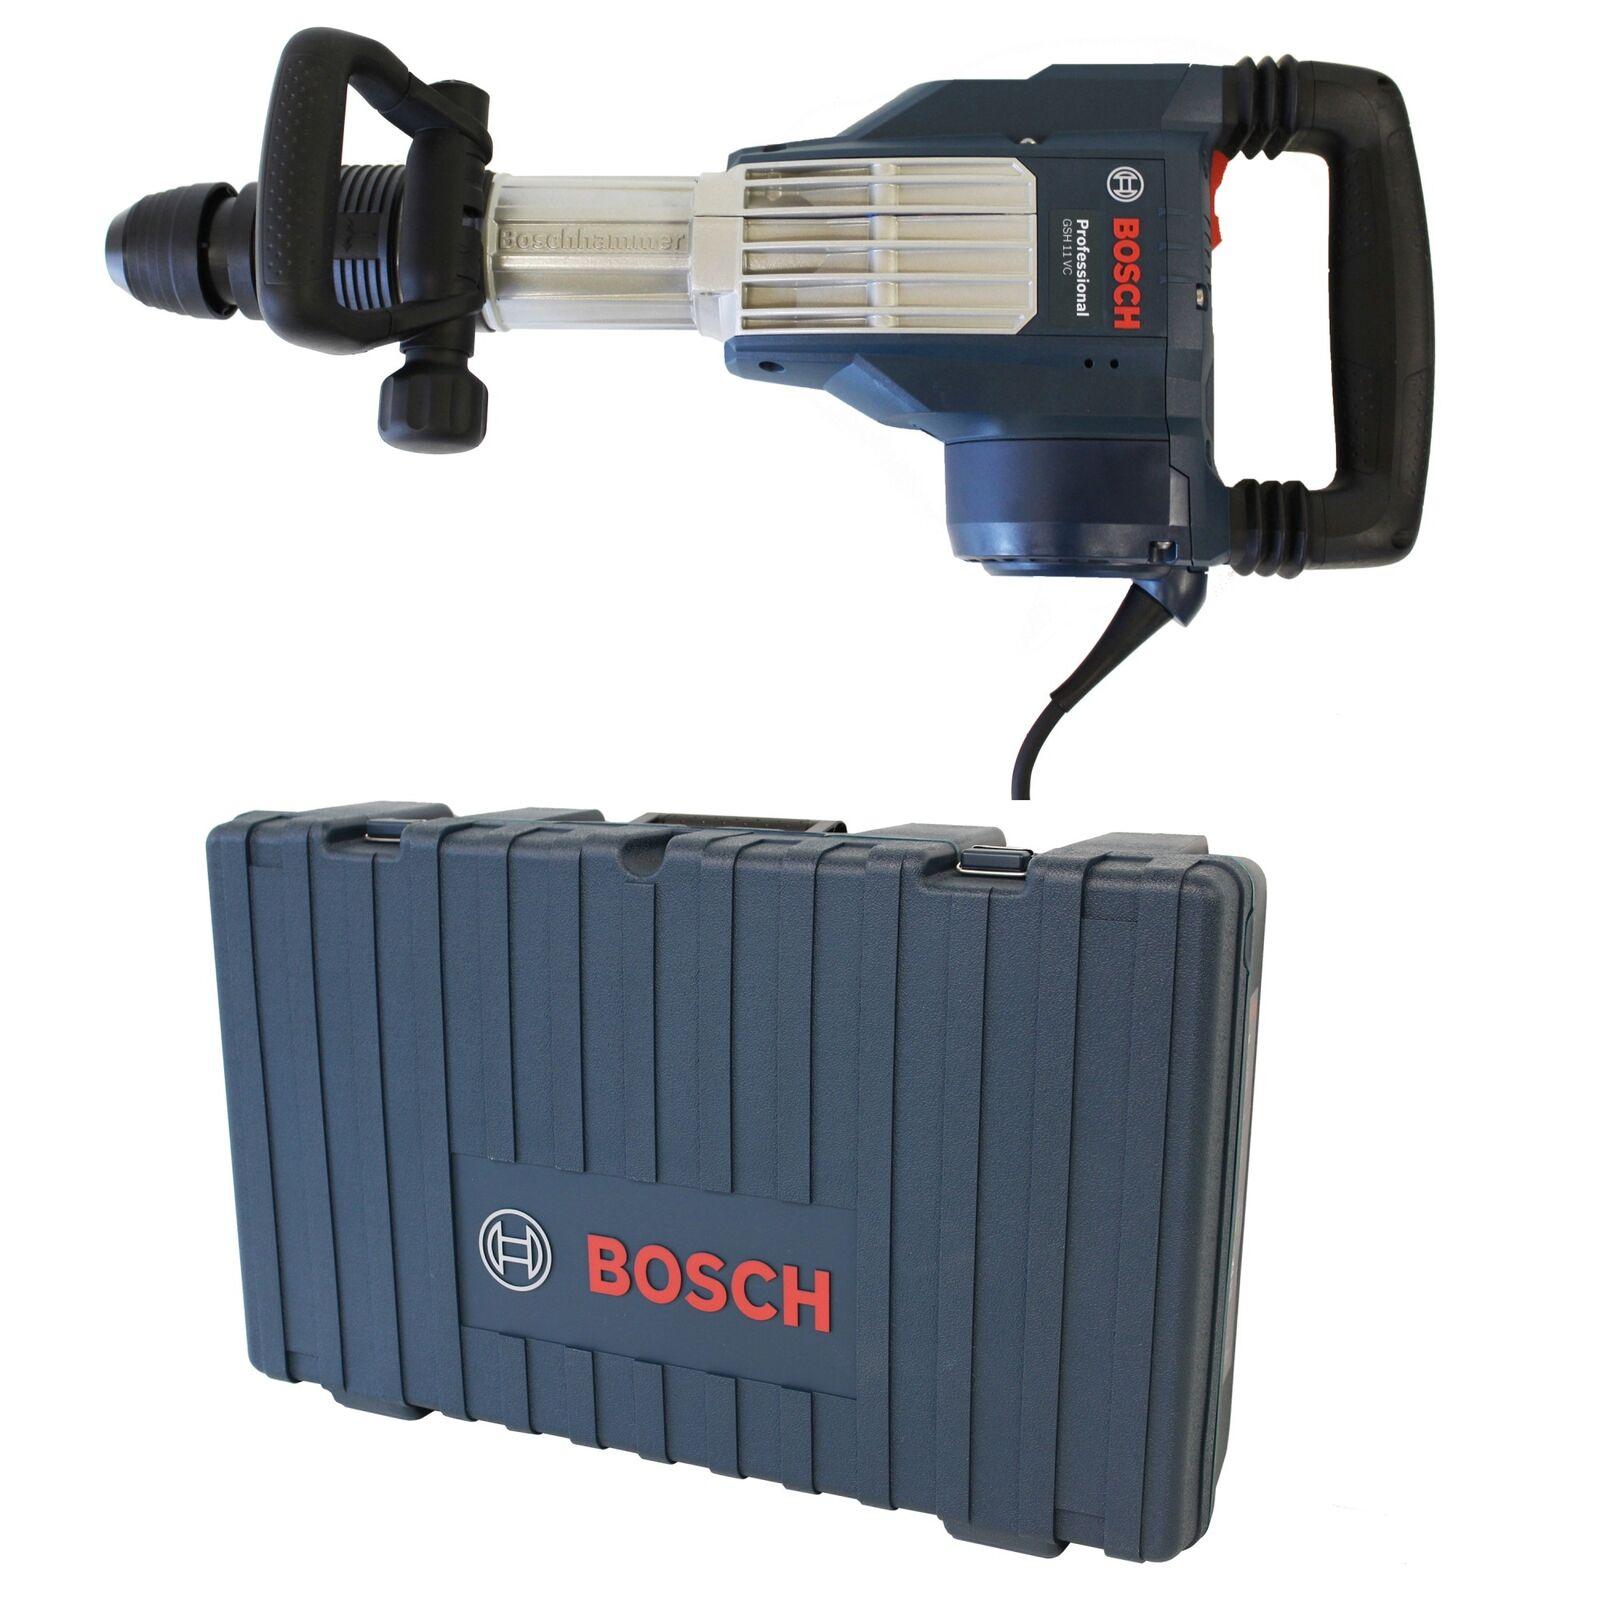 Bosch GSH11VC Schlaghammer Meisselhammer 0611336000